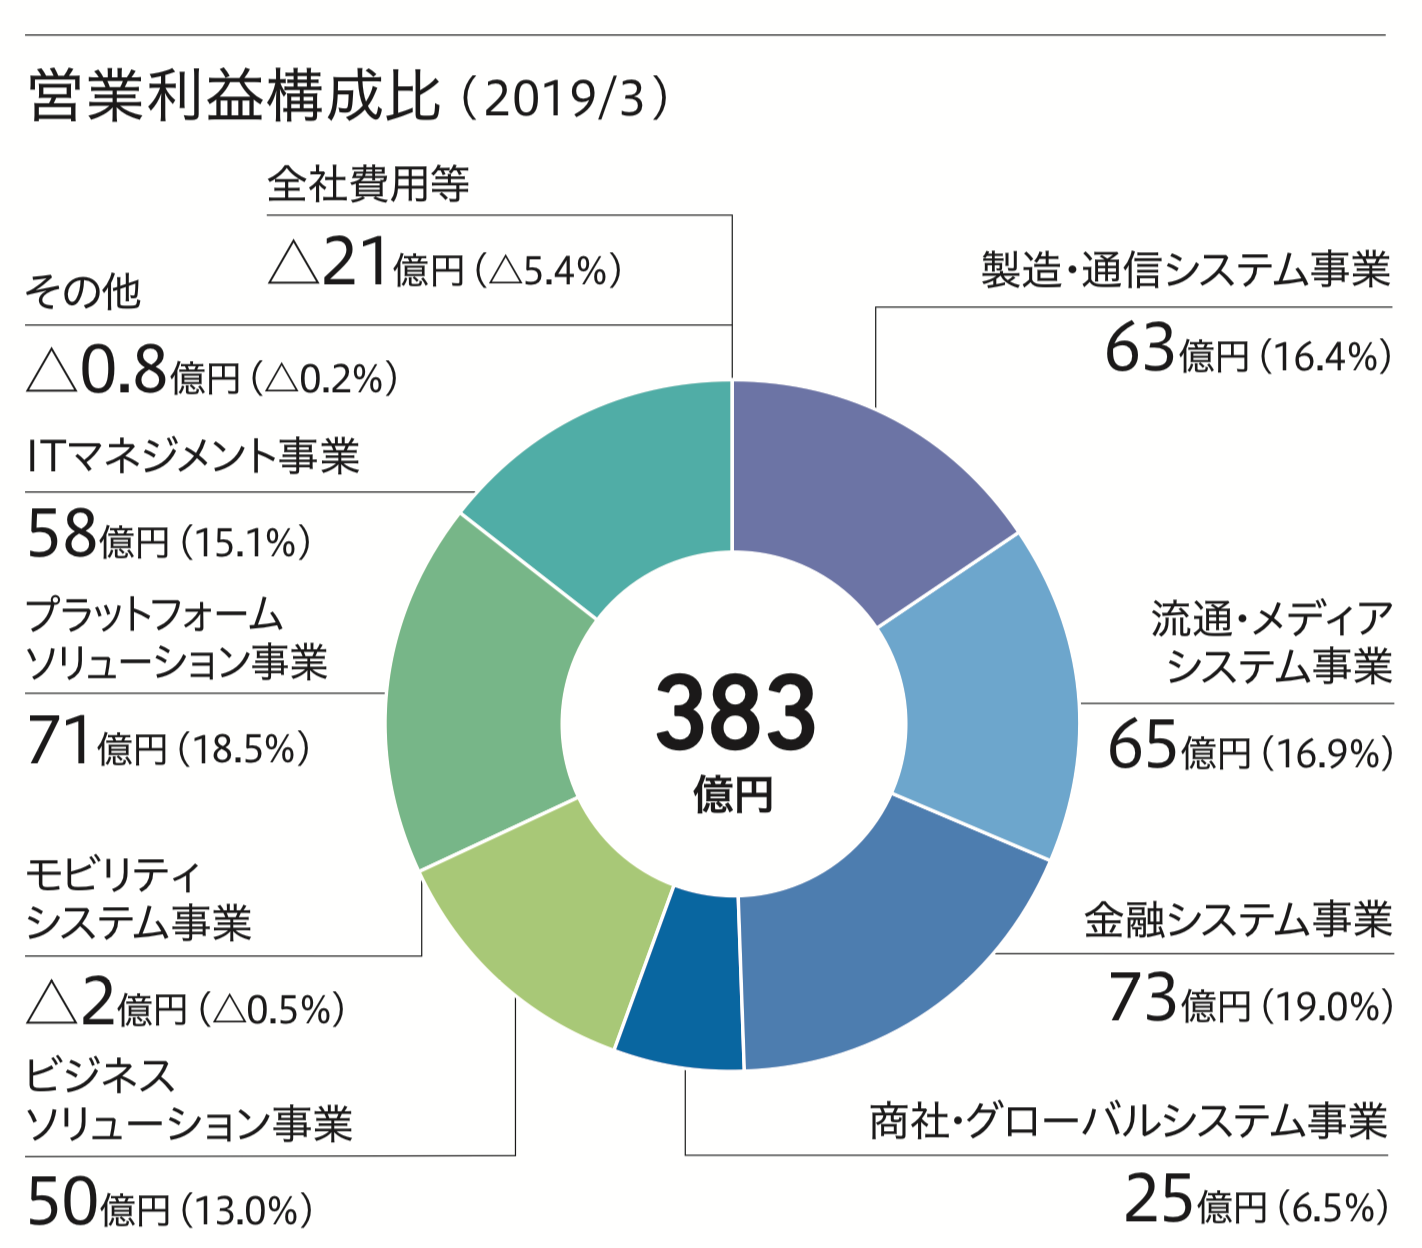 SCSK 営業利益構成比 ( 2019/3 )